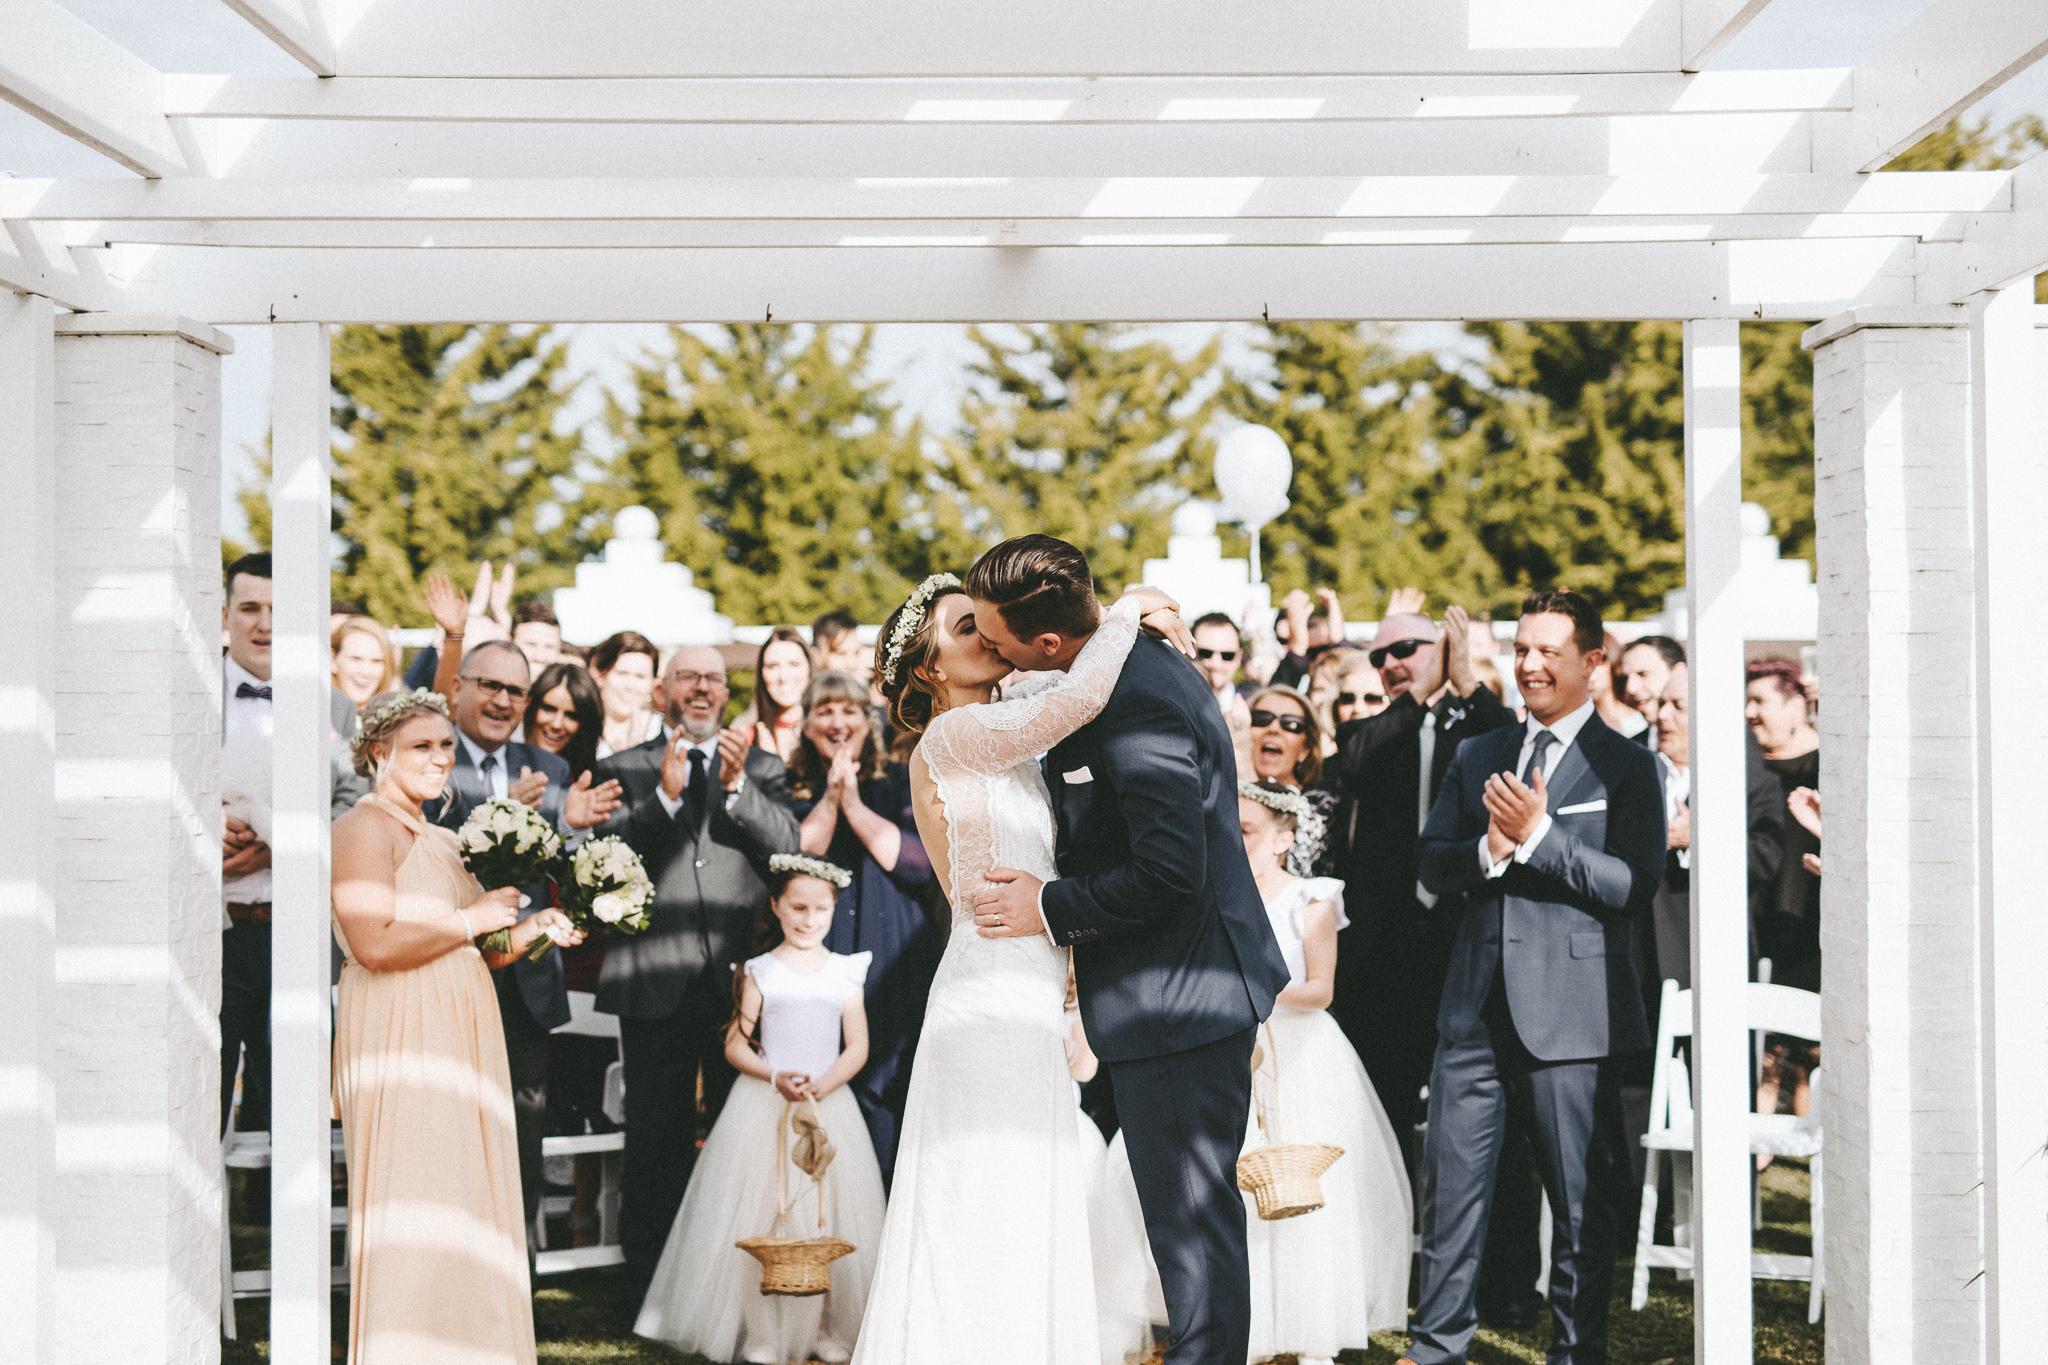 christopher morrison_adelaide hills wedding_ andy + teegan_49_0622.jpg